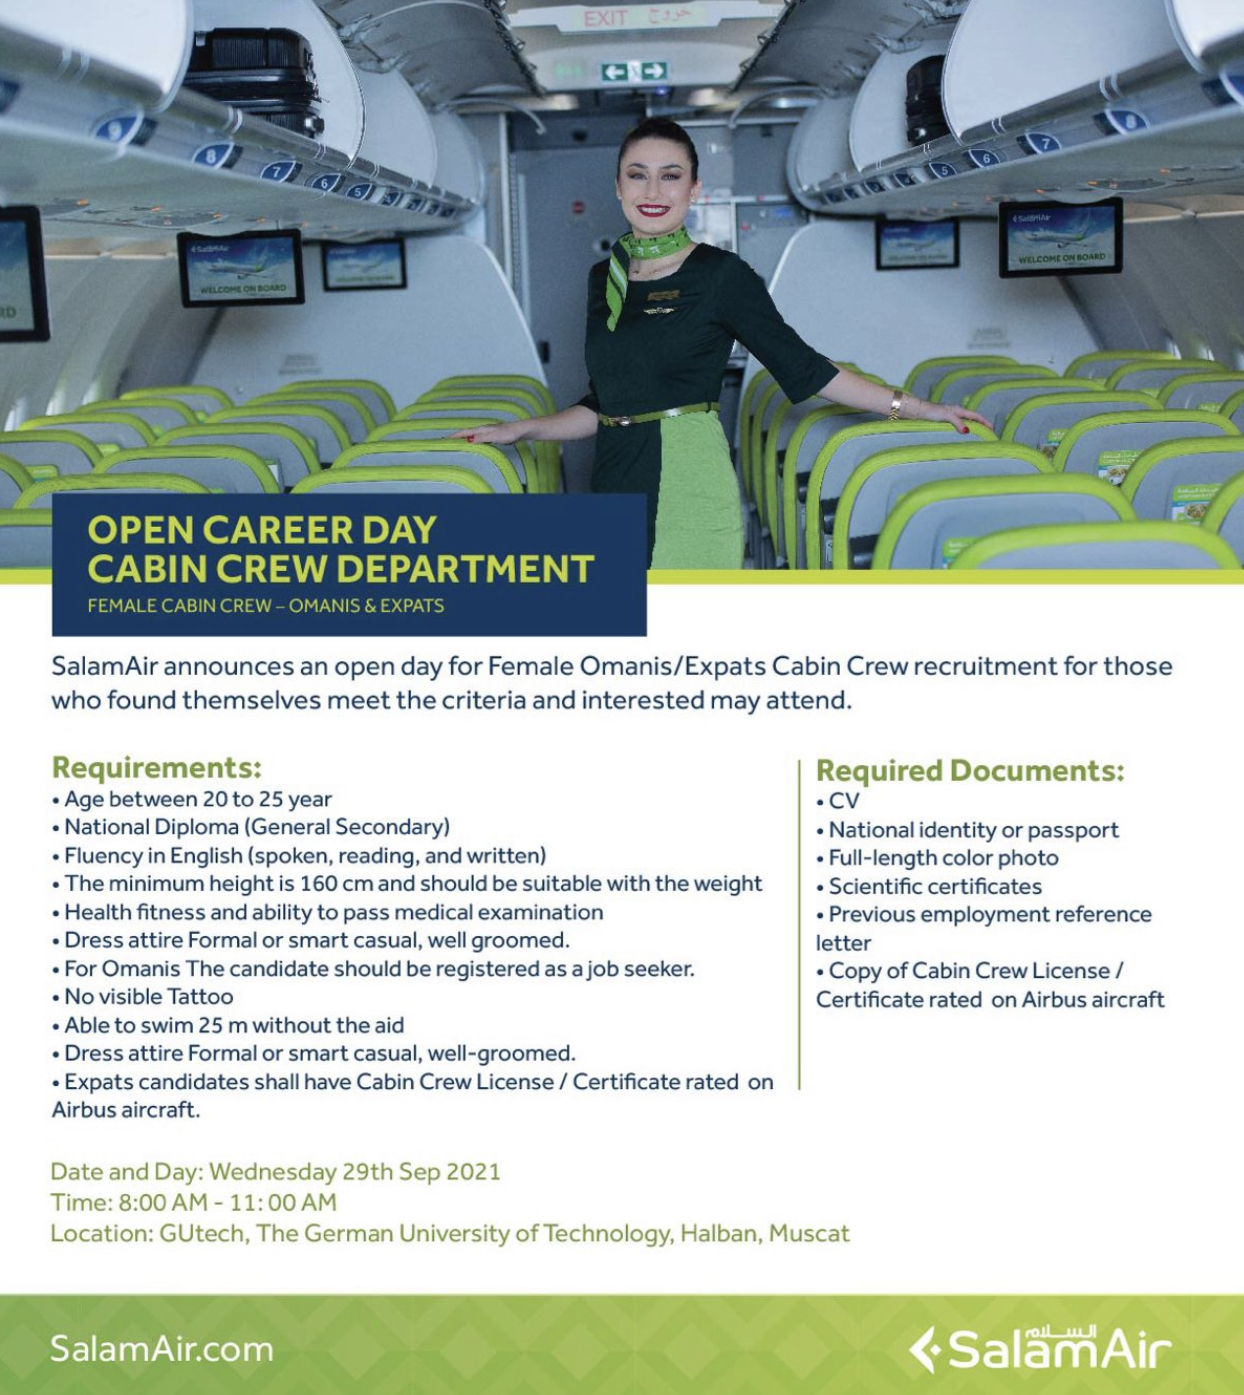 Salam Air Cabin Crew Recruitment -Sep 2021